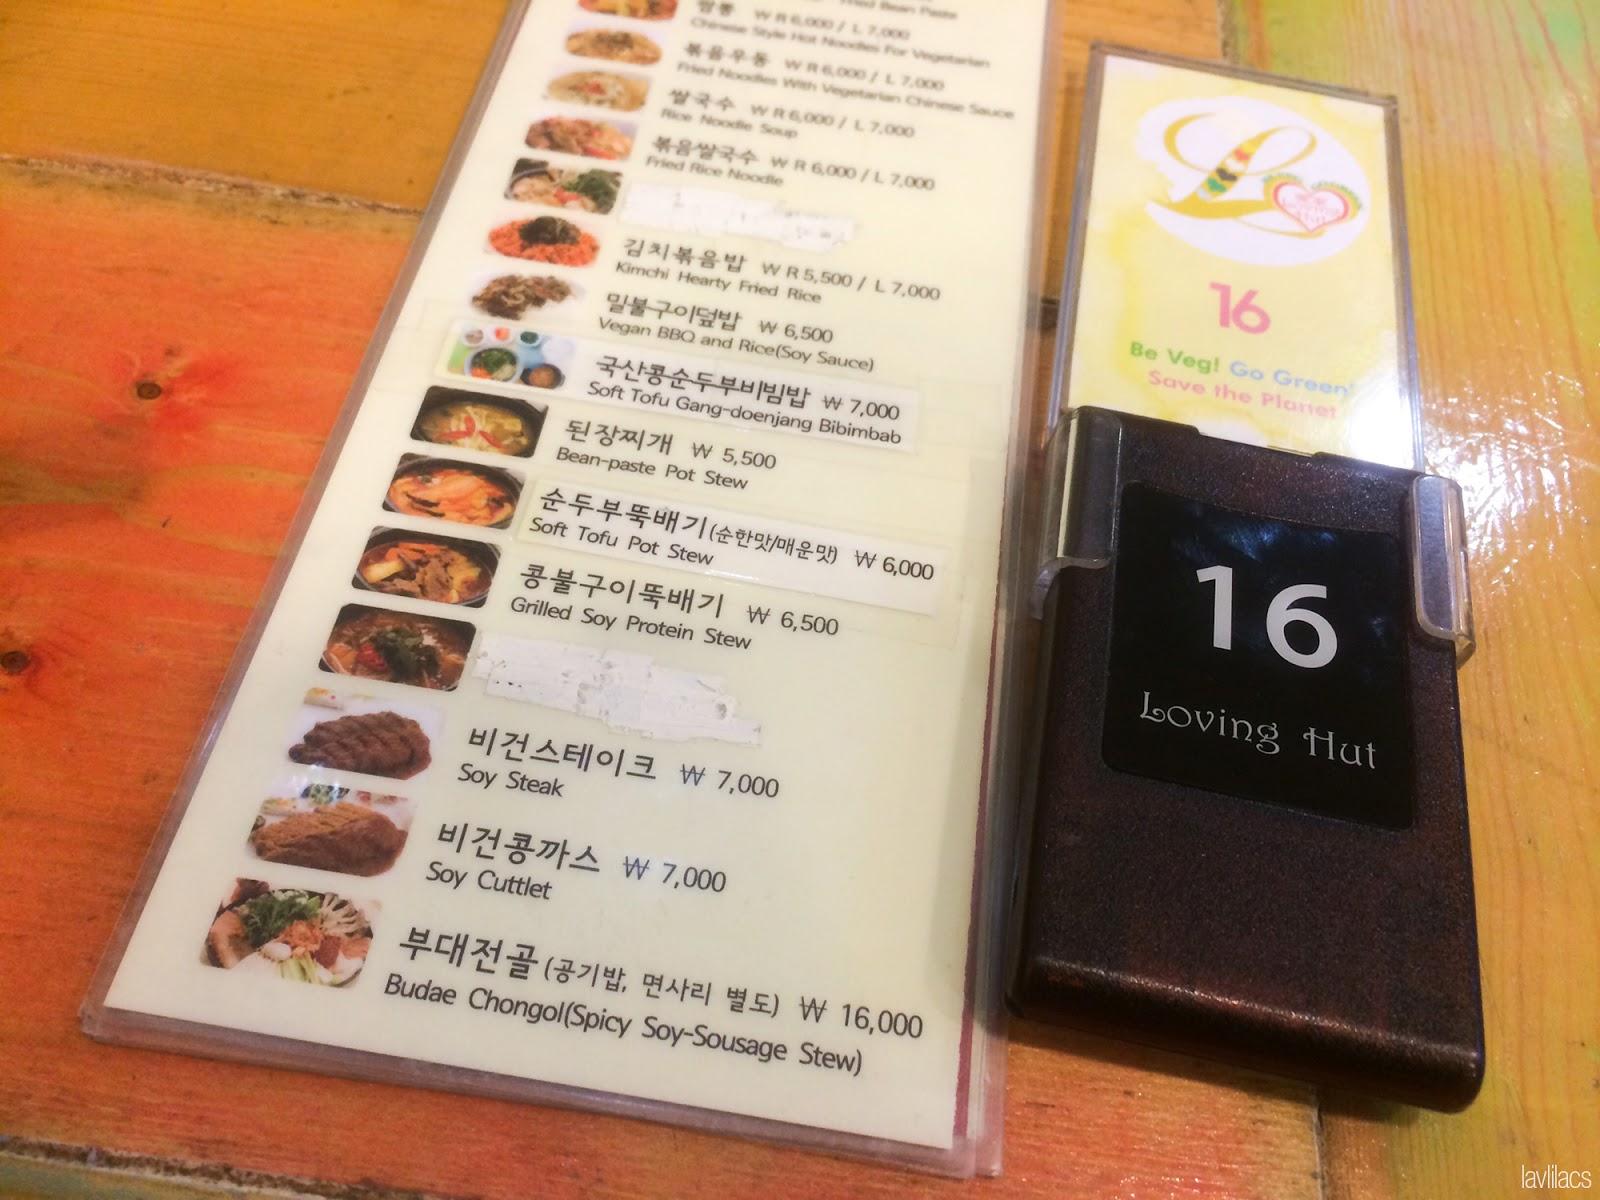 Seoul, Korea - Summer Study Abroad 2014 - Loving Hut - Vegan Restaurant menu